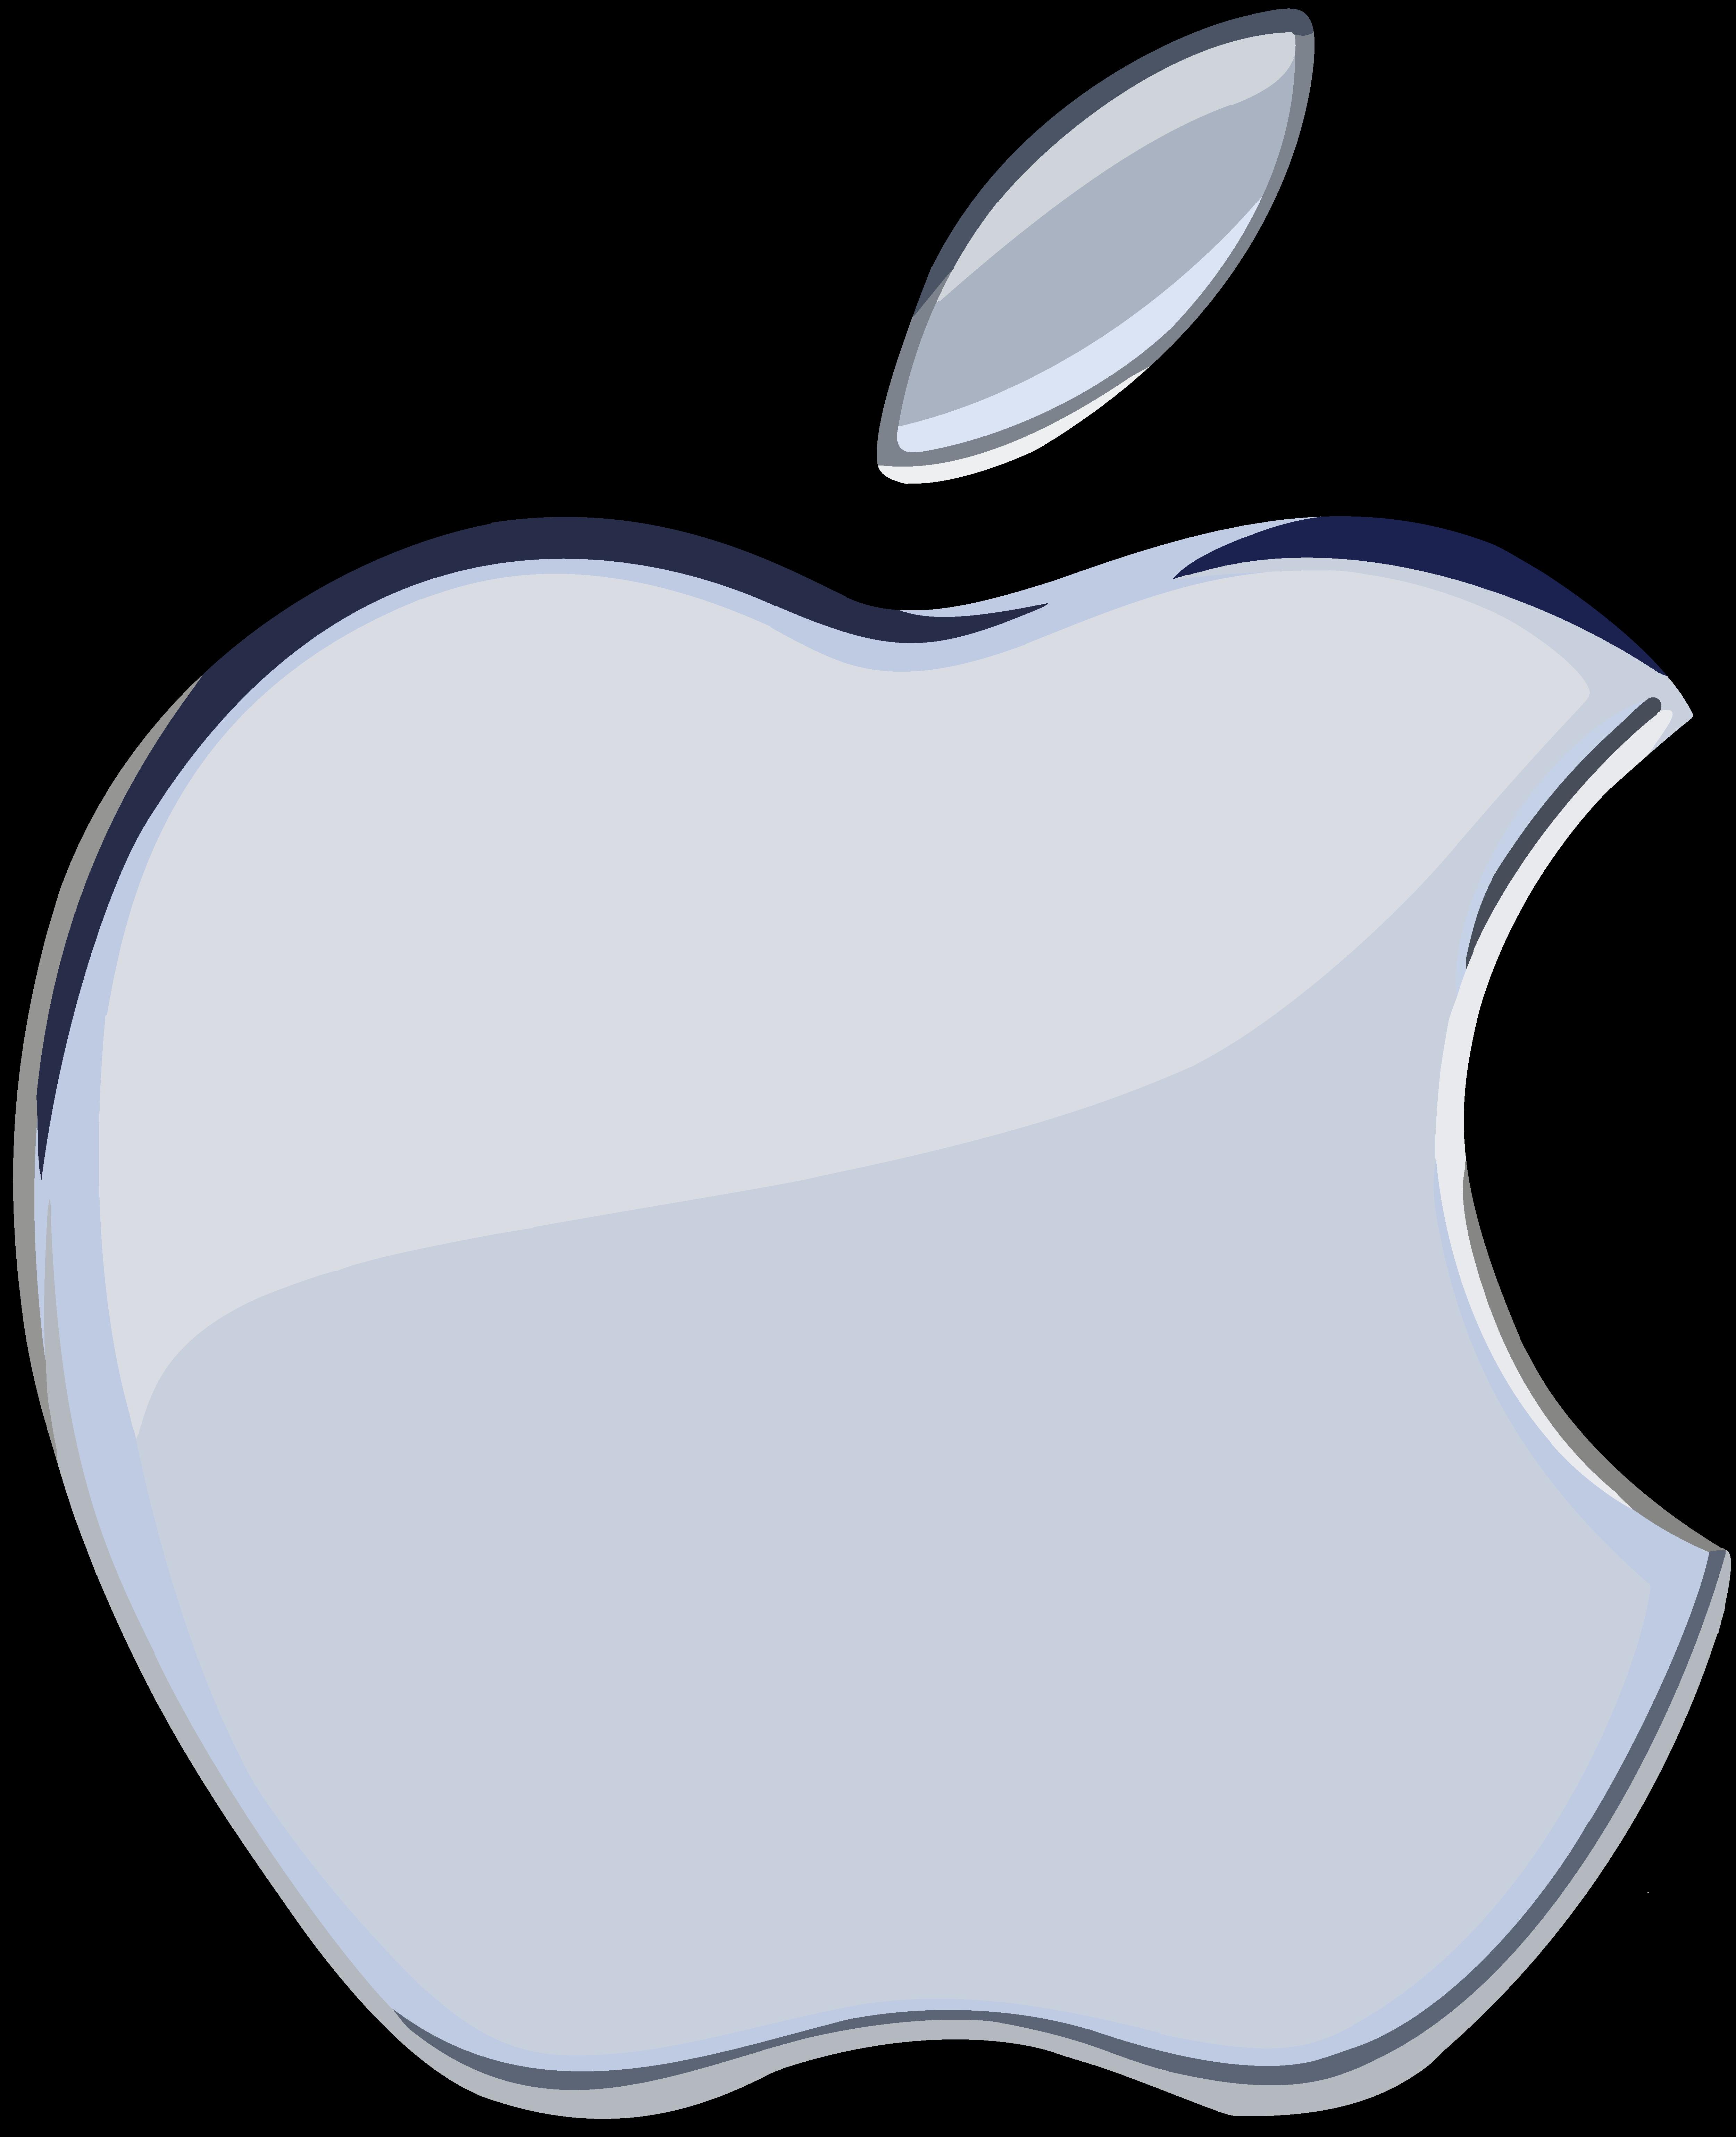 apple logo white transparent. silver apple logo 1 flat by windytheplaneh white transparent